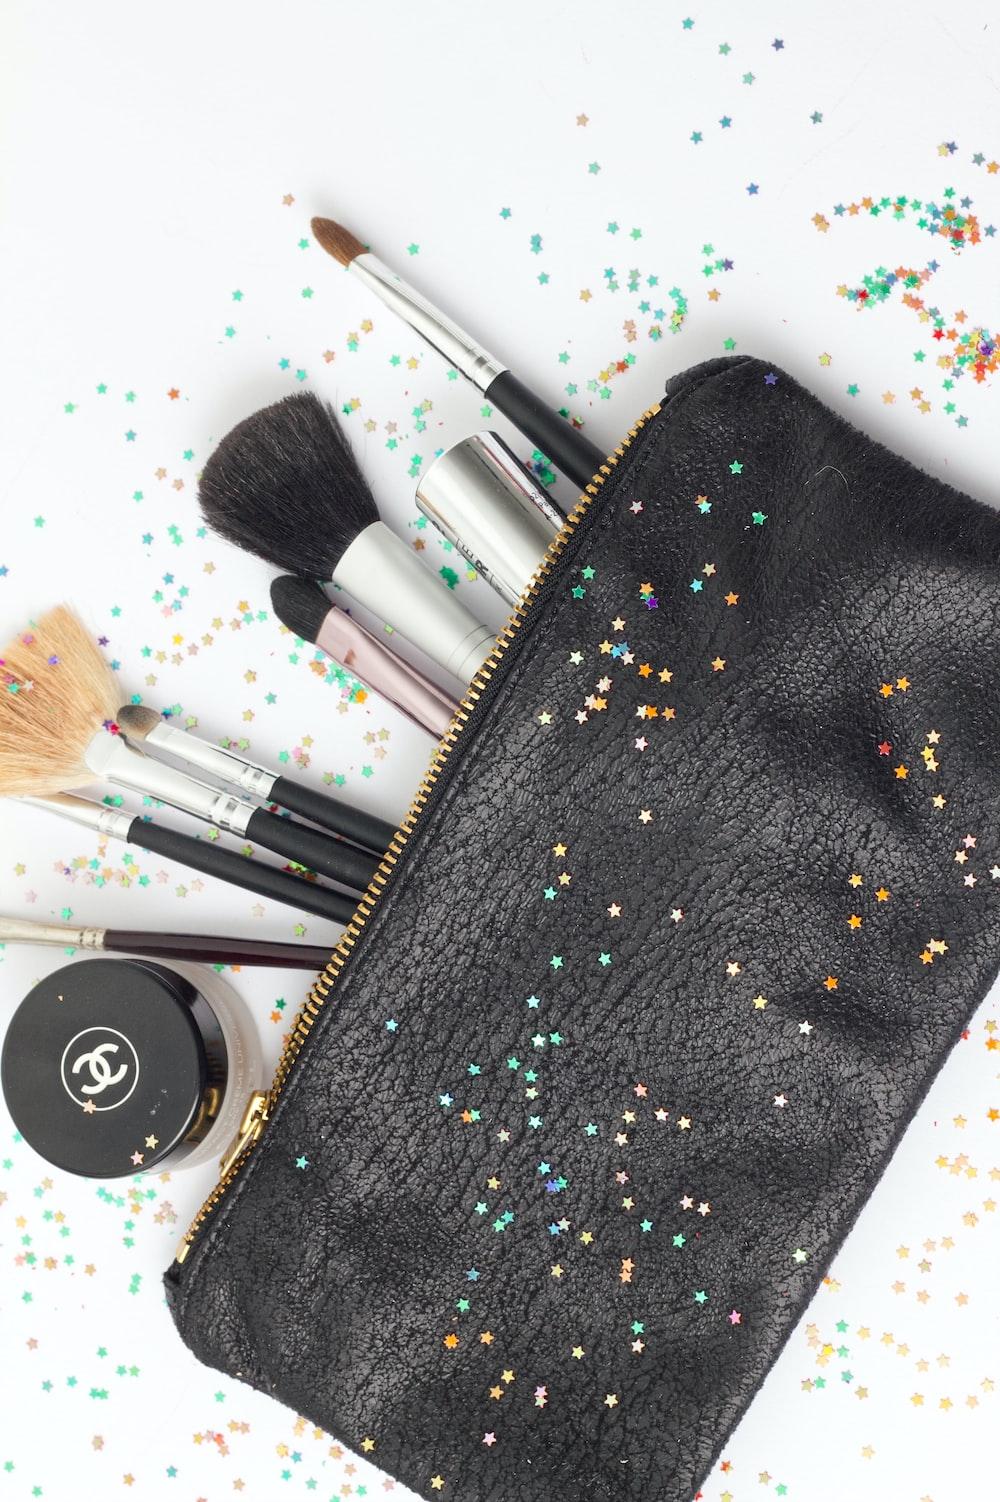 black and white makeup brush set